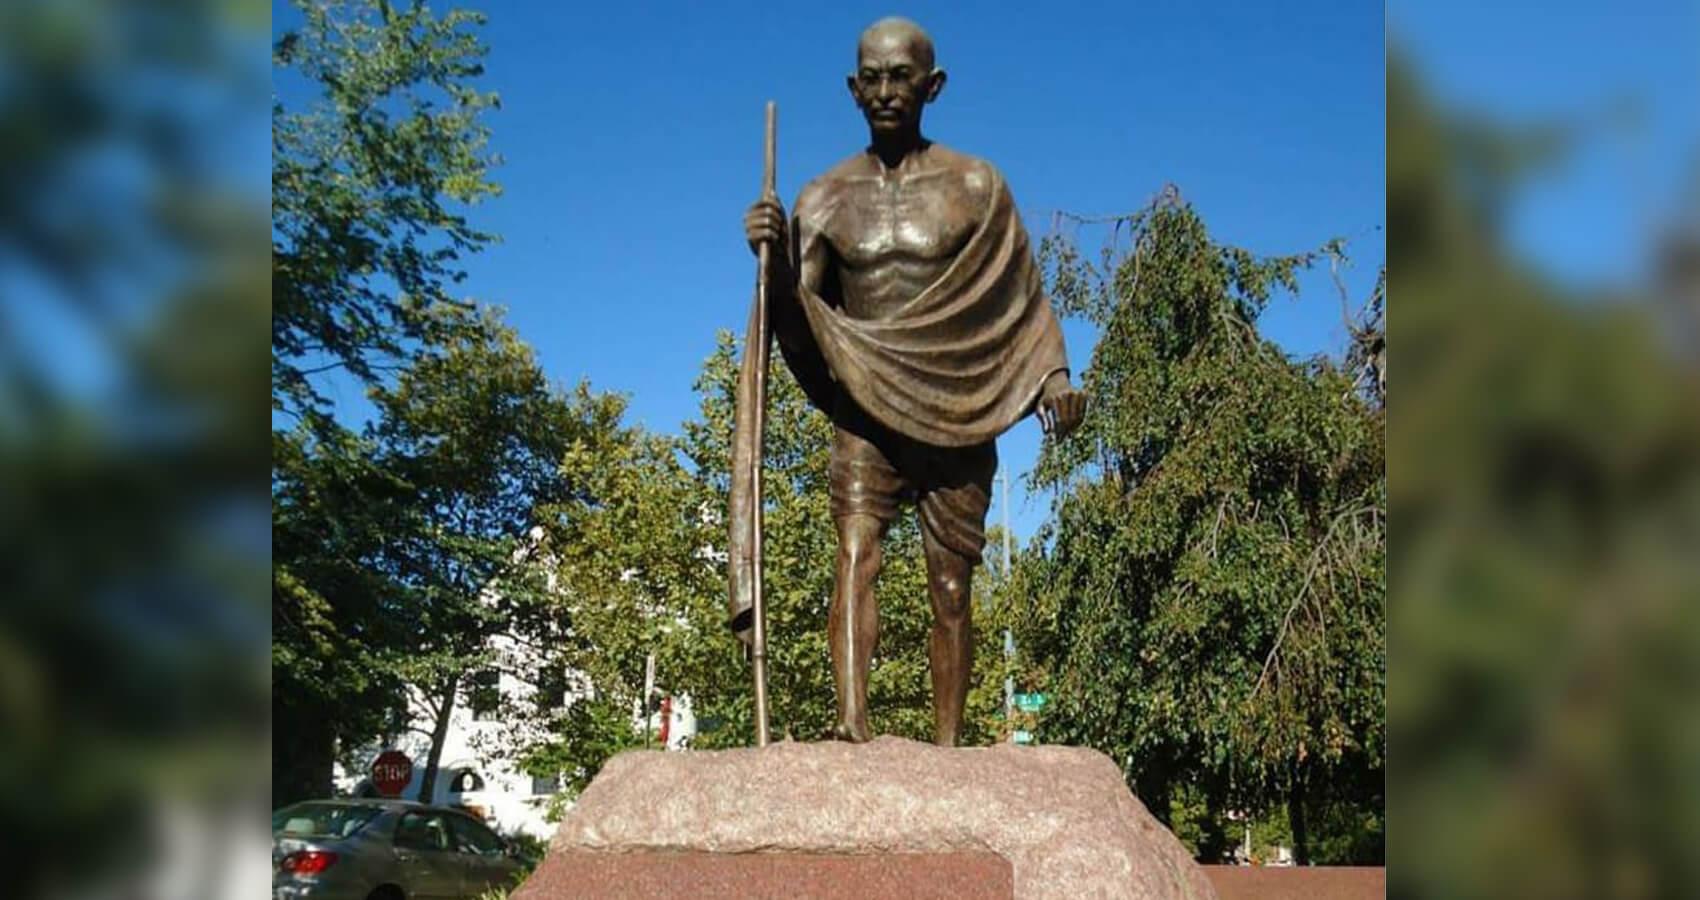 Mahatma Gandhi Statue at the Indian Embassy in Washington Vandalized